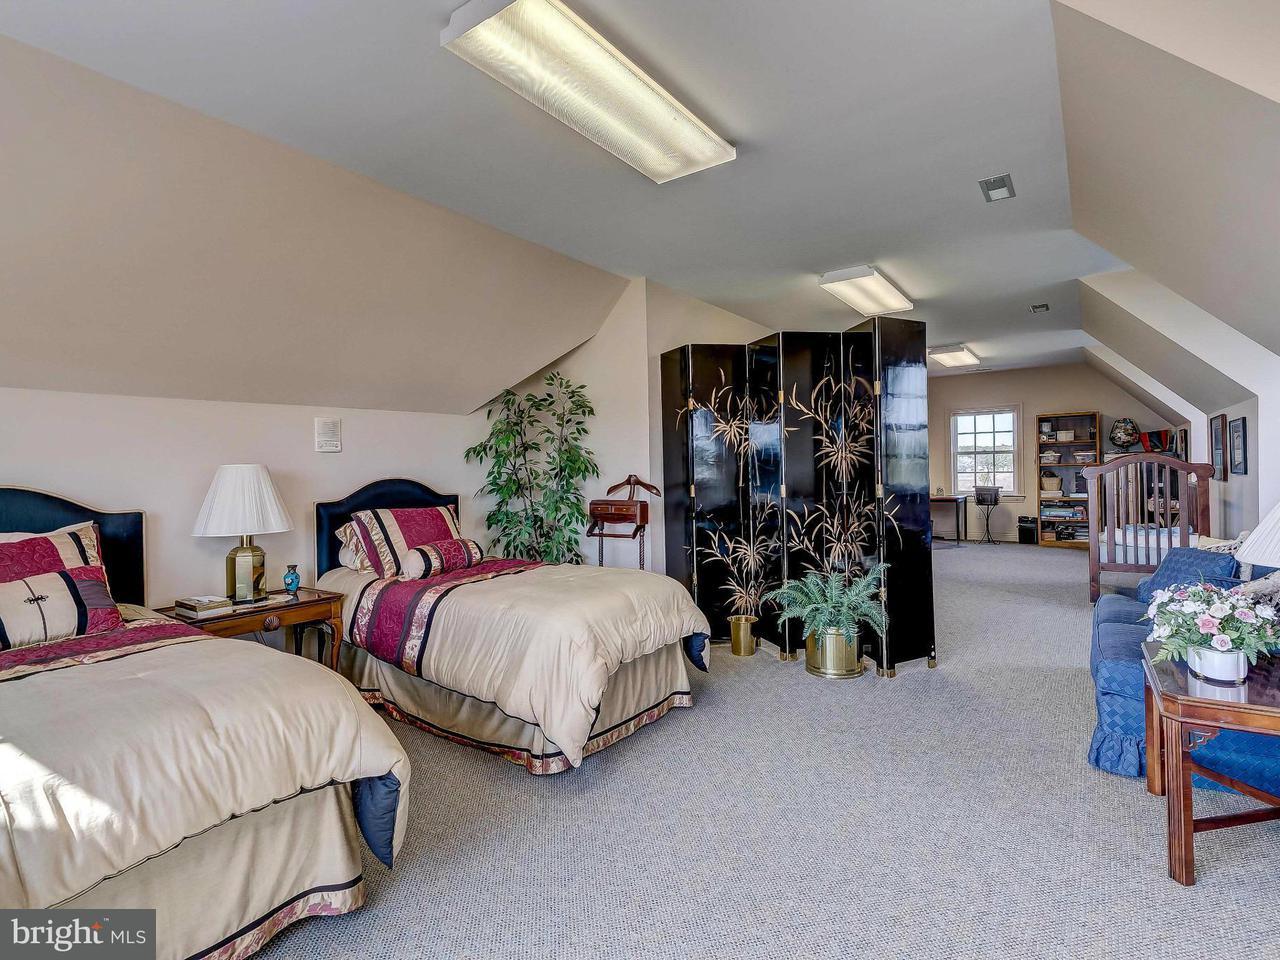 Additional photo for property listing at 5559 Cassons Neck Road 5559 Cassons Neck Road Cambridge, Μεριλαντ 21613 Ηνωμενεσ Πολιτειεσ